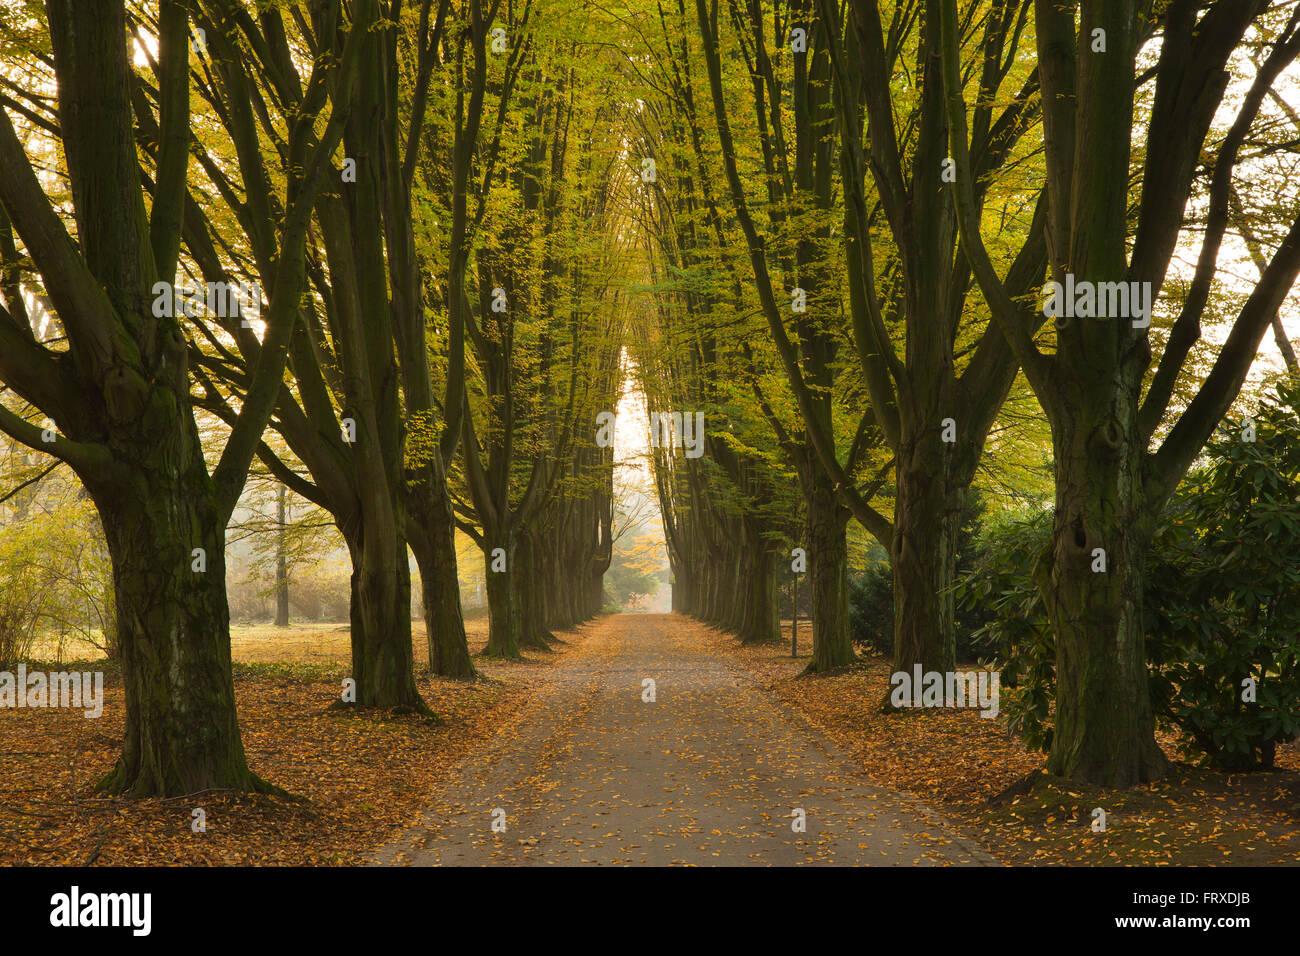 Hornbeam alley, Dortmund, North Rhine-Westphalia, Germany - Stock Image